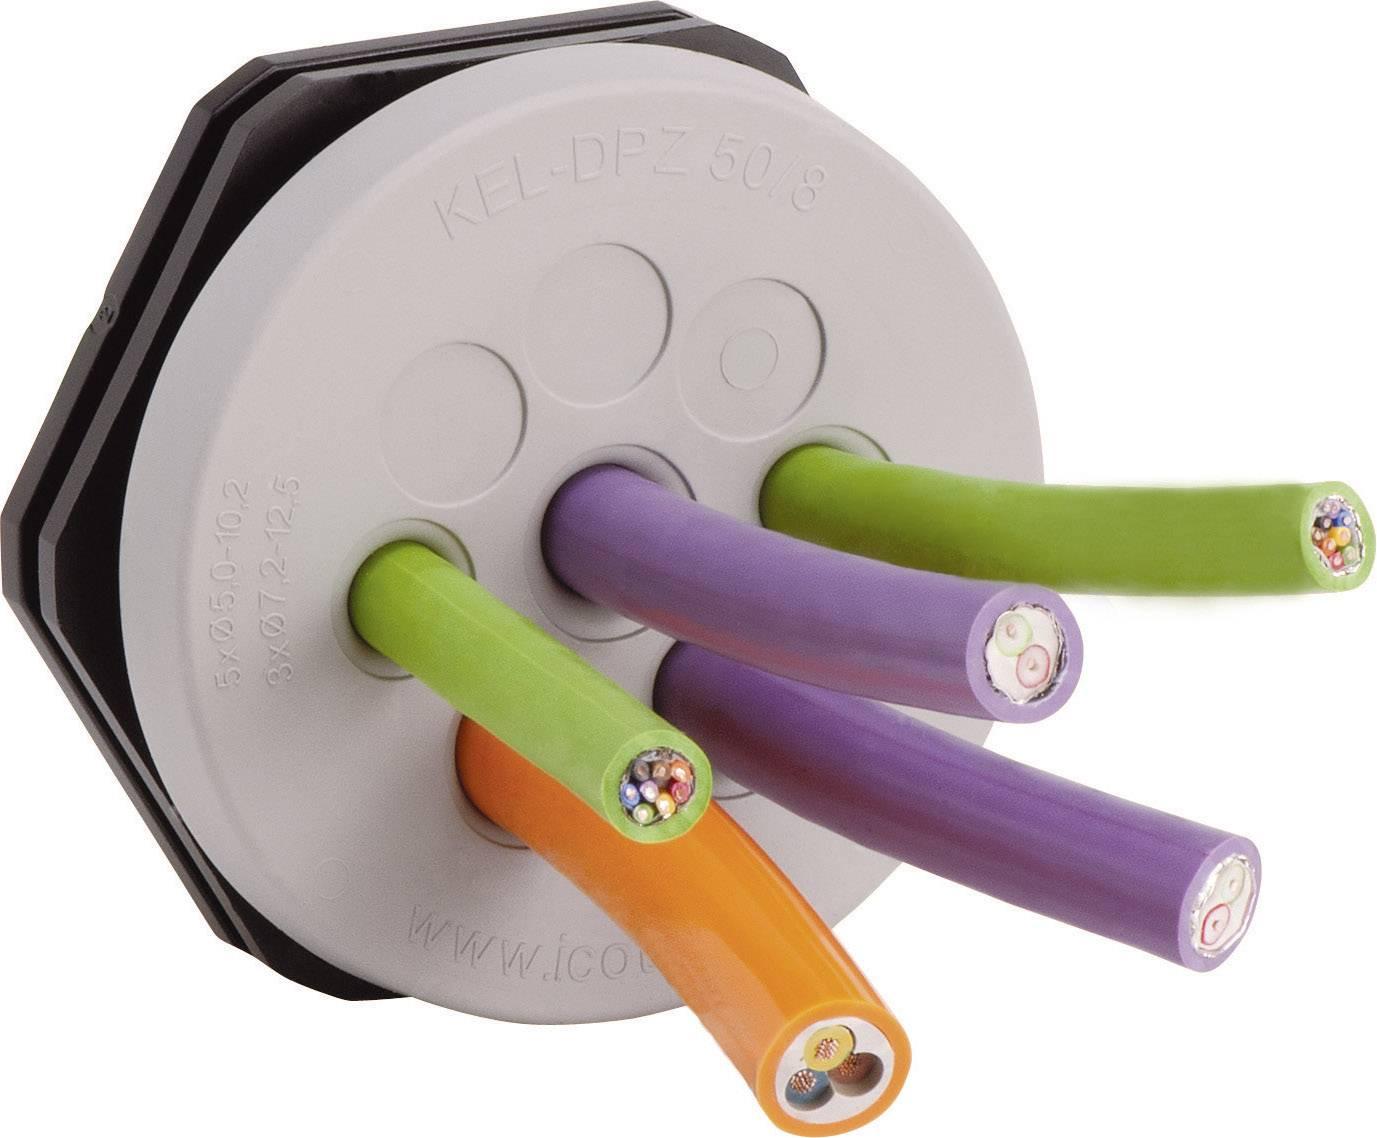 Icotek Uvodnica za kable KEL-DPZ okrogla KEL-DPZ 50|10 velikost: M50 poliamid/elastomer, siva